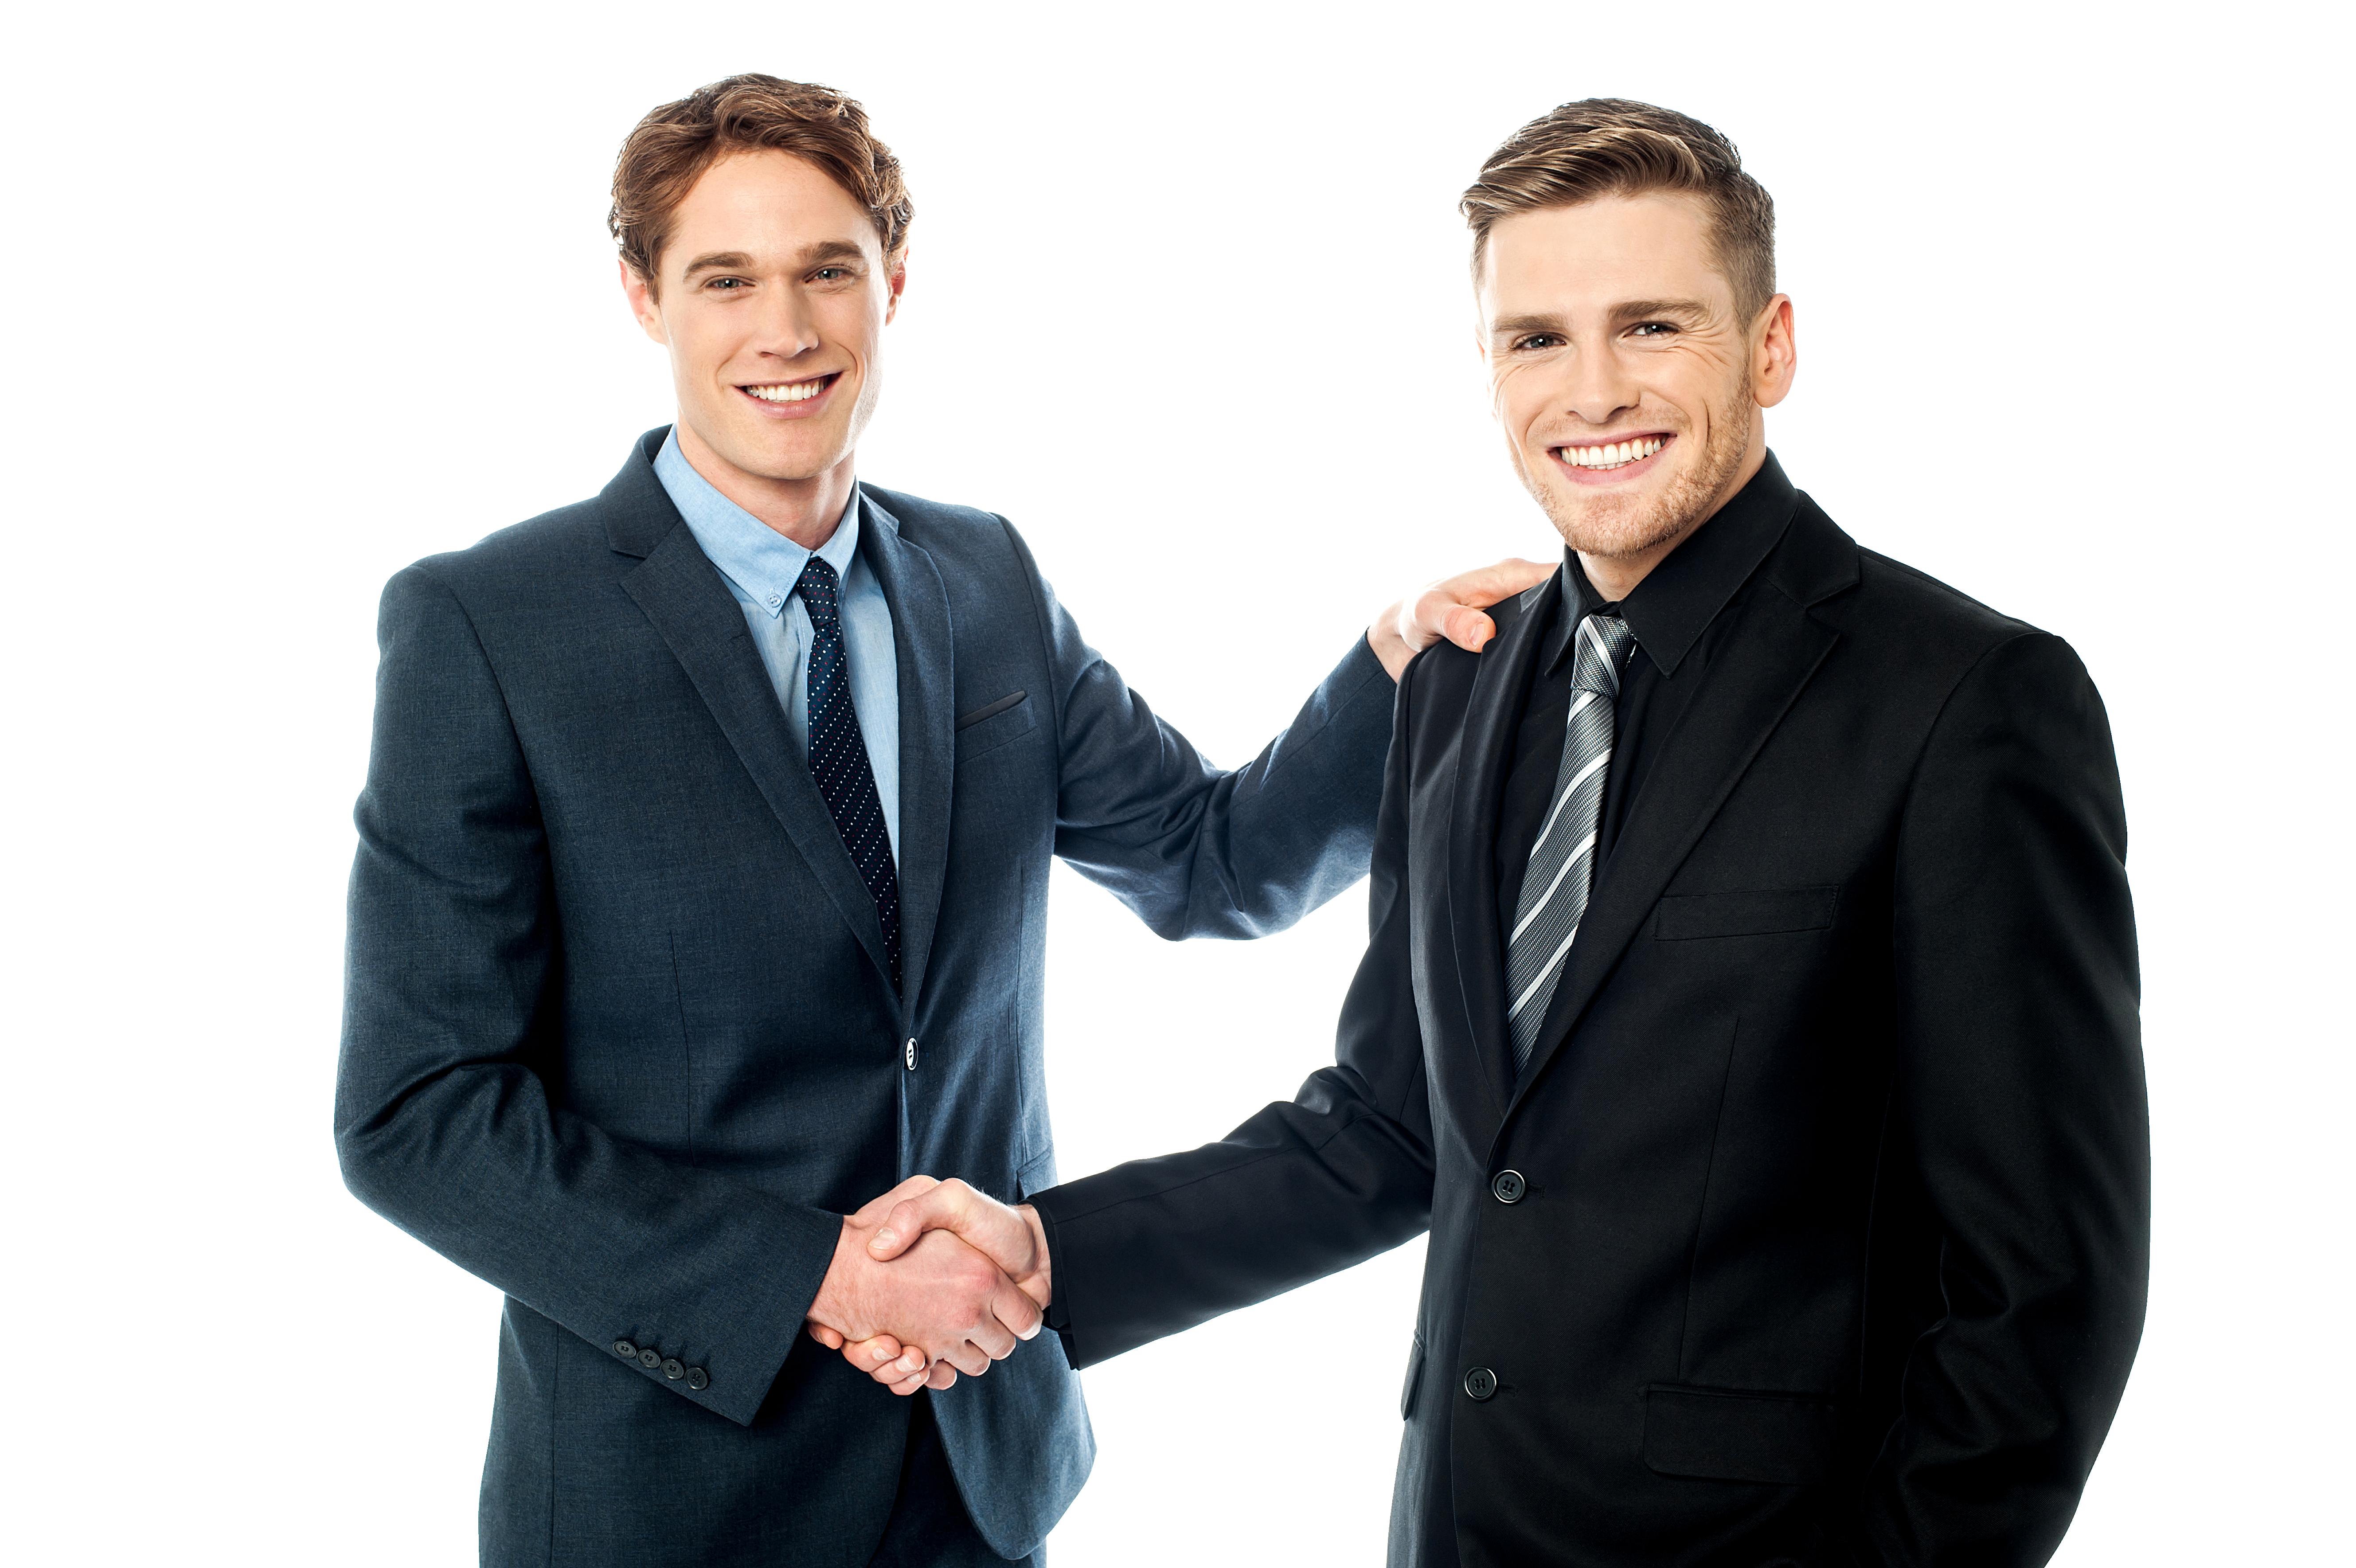 Png image purepng free. Handshake clipart business customer